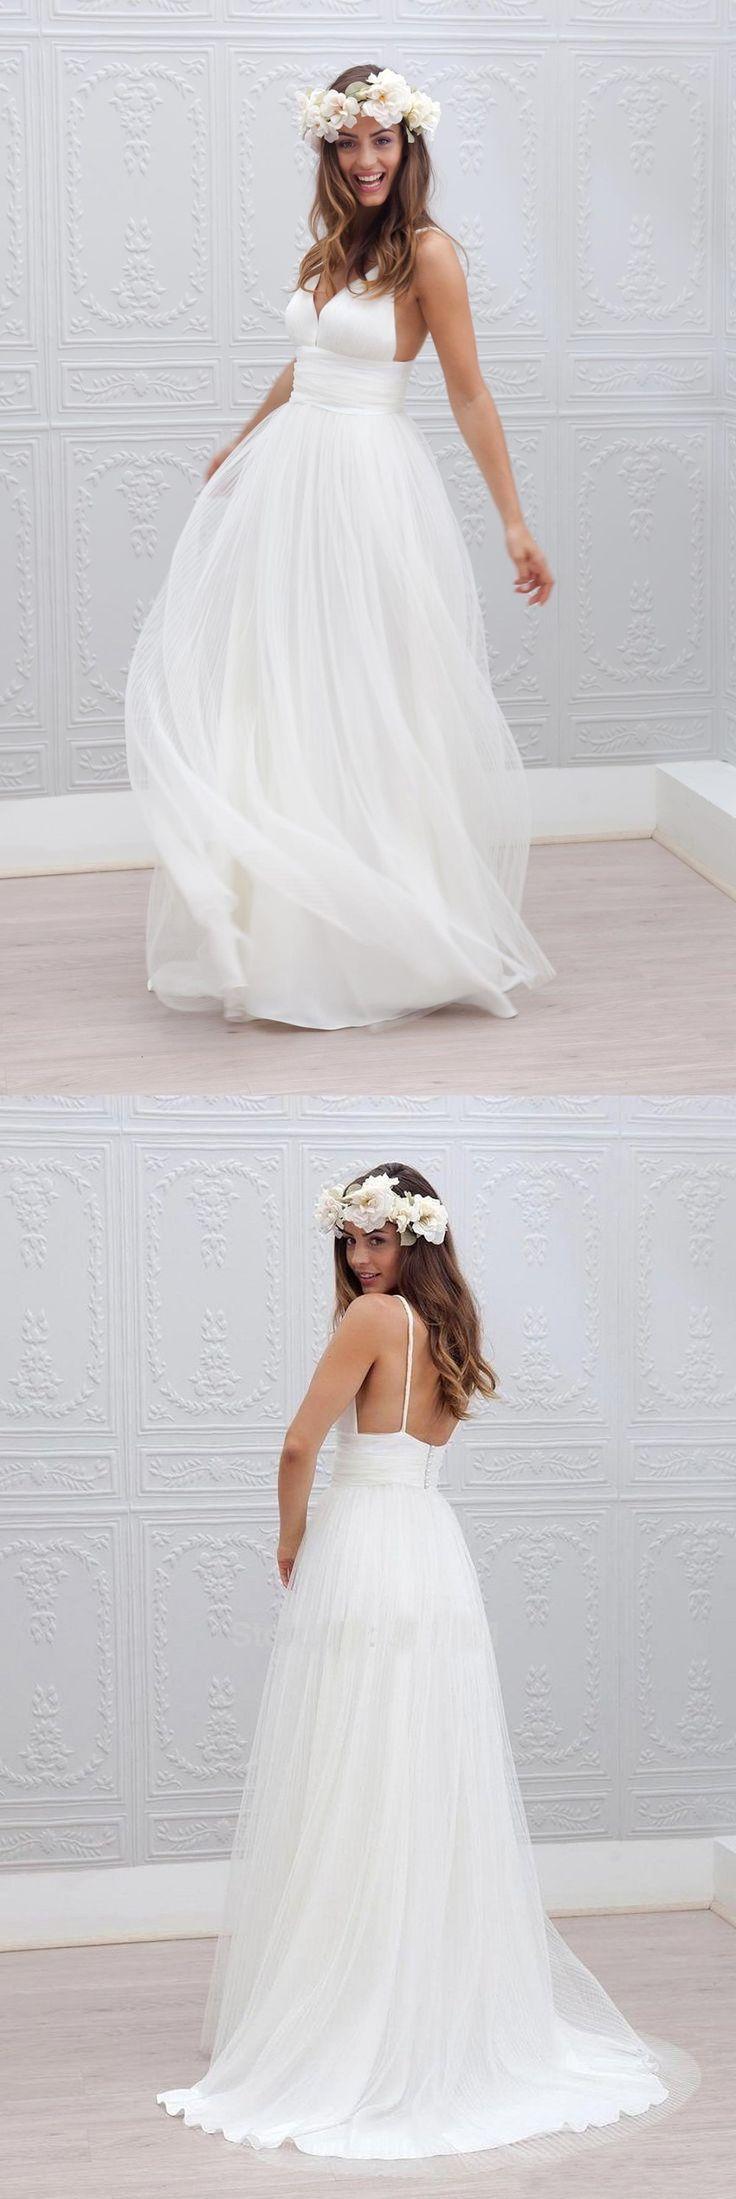 Cool beach wedding dresswhite wedding dressesbackless bridal gowns